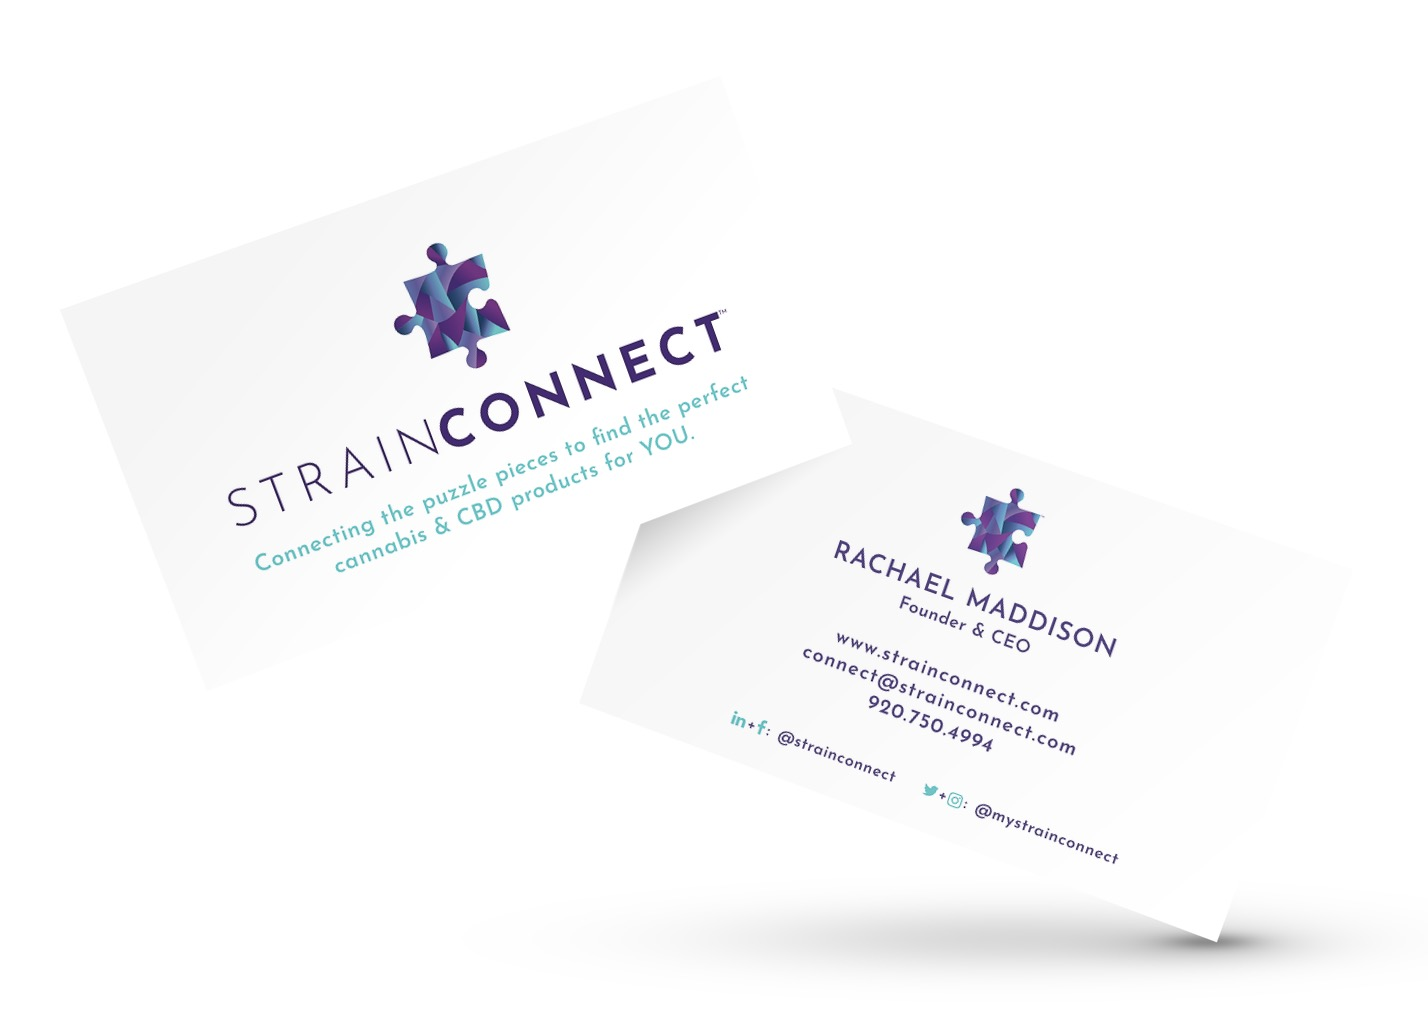 StrainConnect business card.jpg